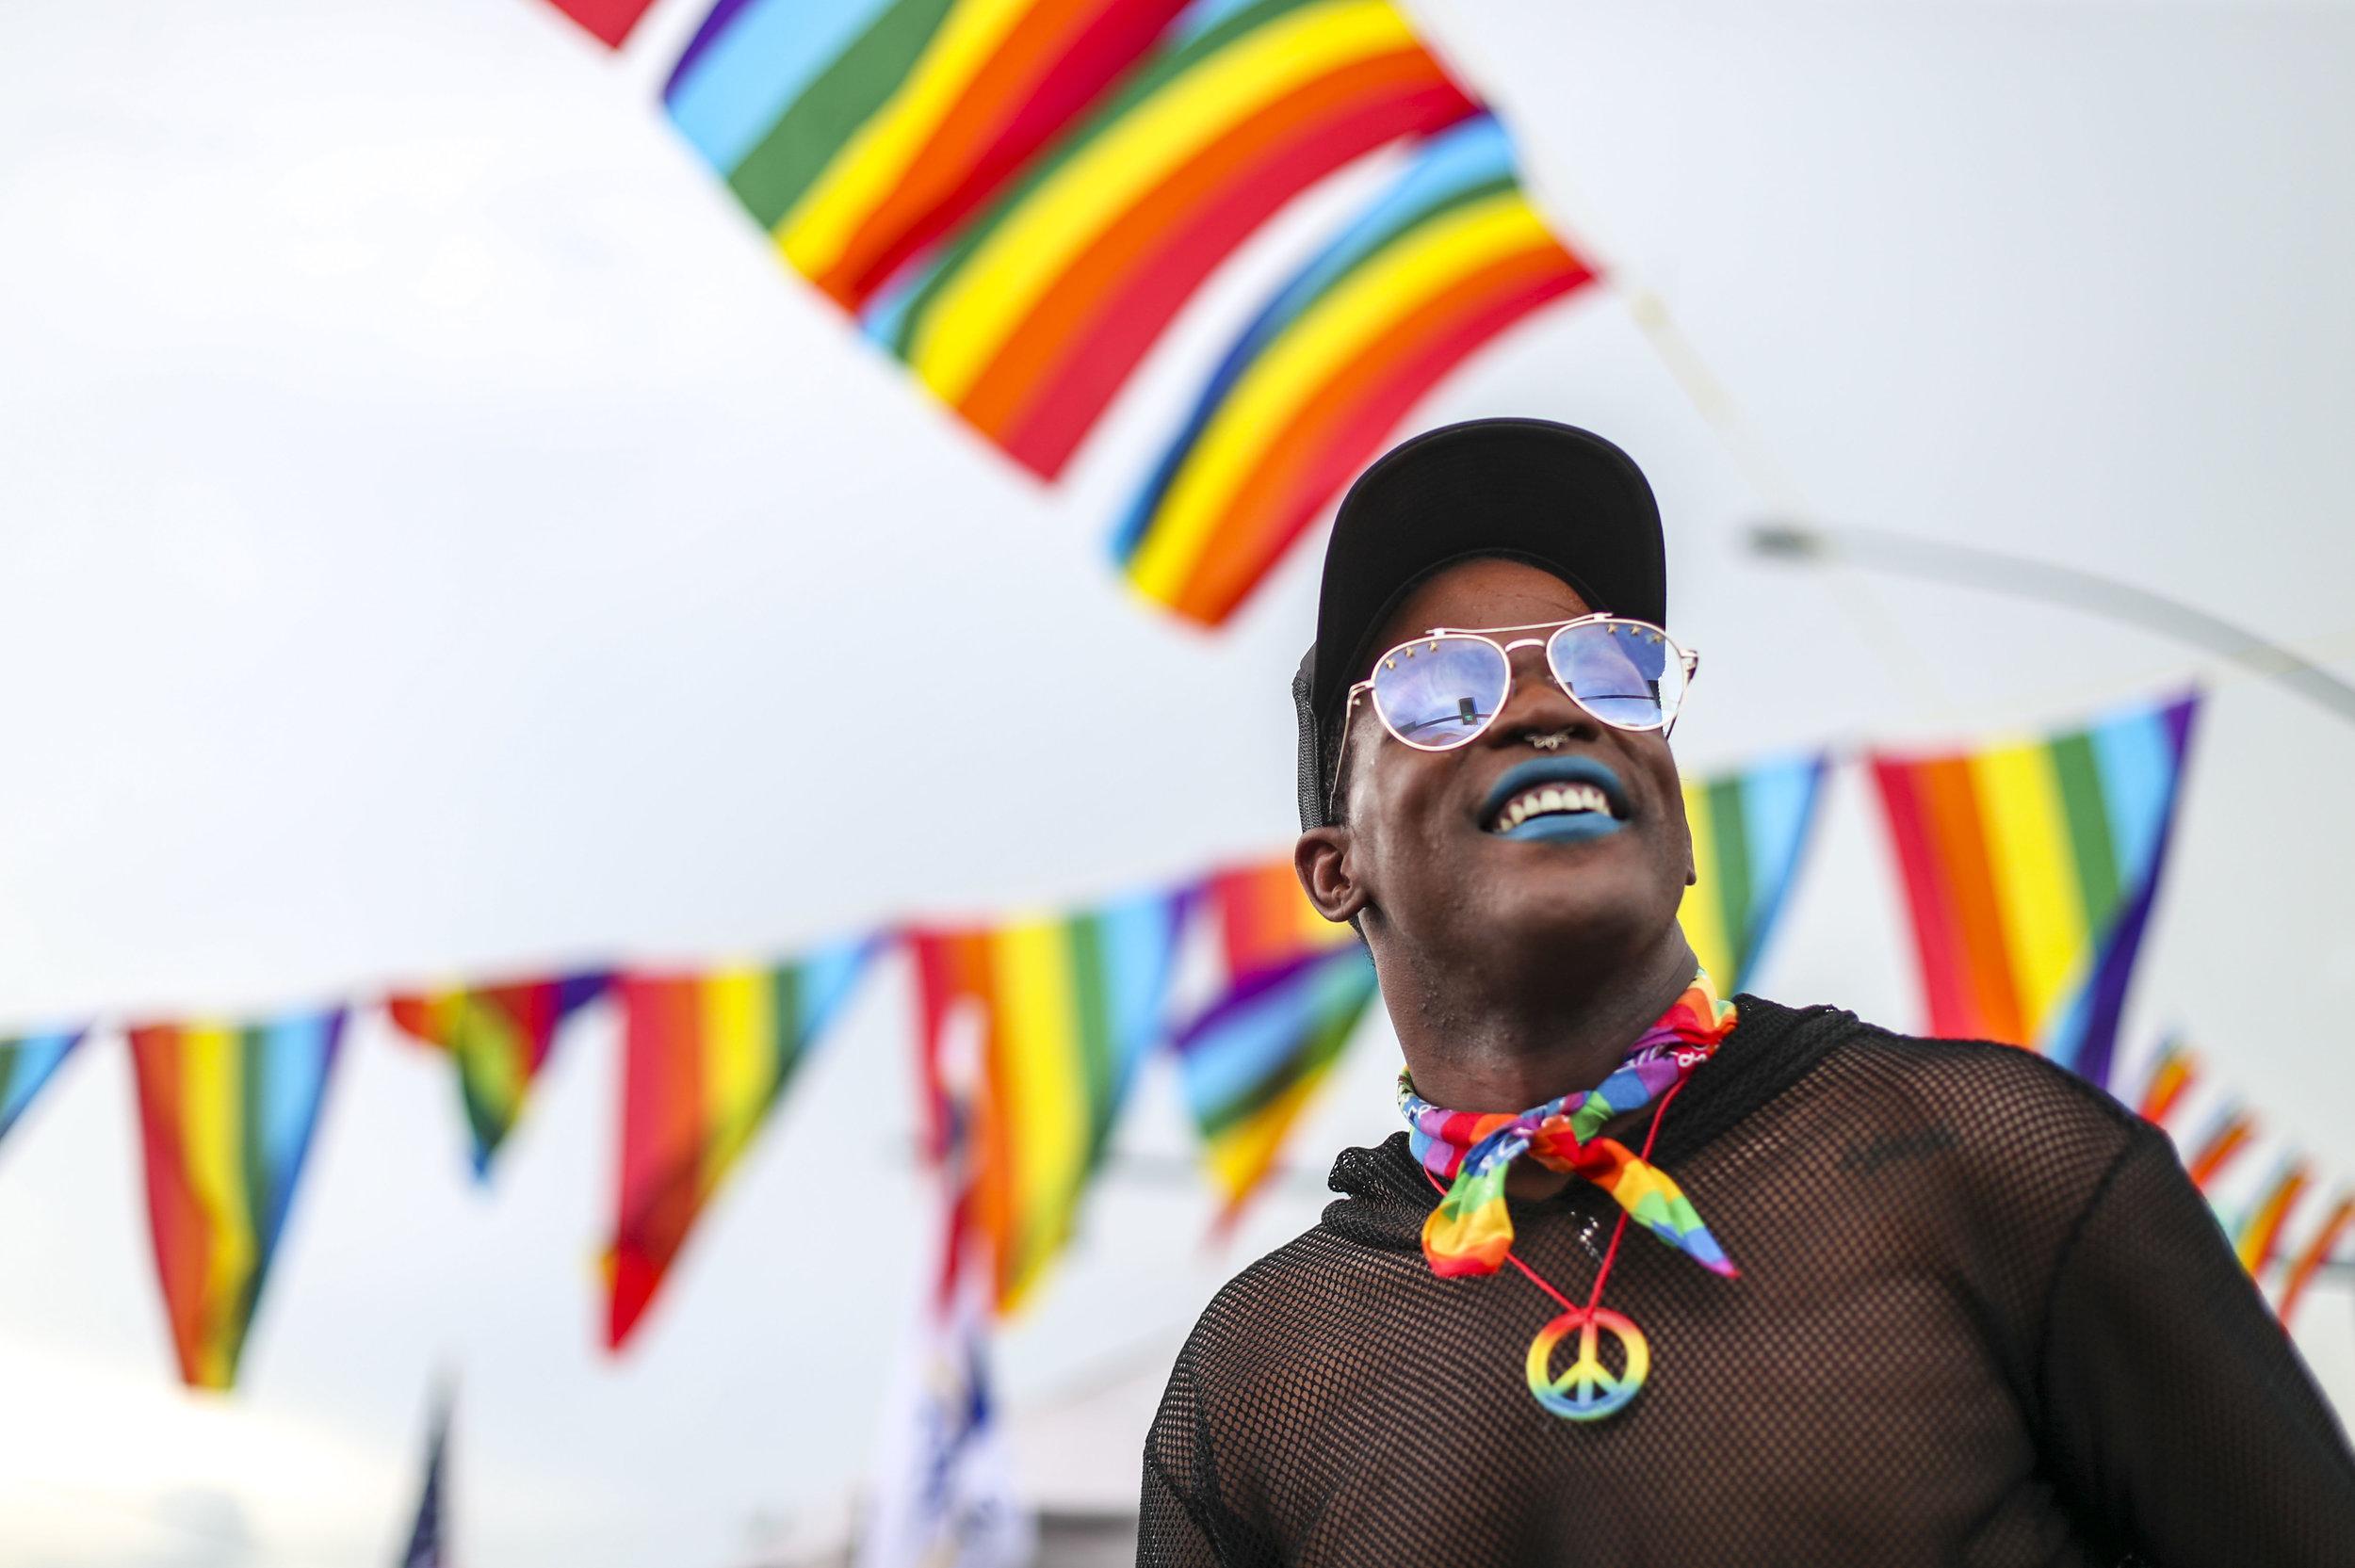 Lucas 'Coco Starr' Burtrum of Rock Island at Pridefest in downtown Davenport, Saturday, June 29, 2019.